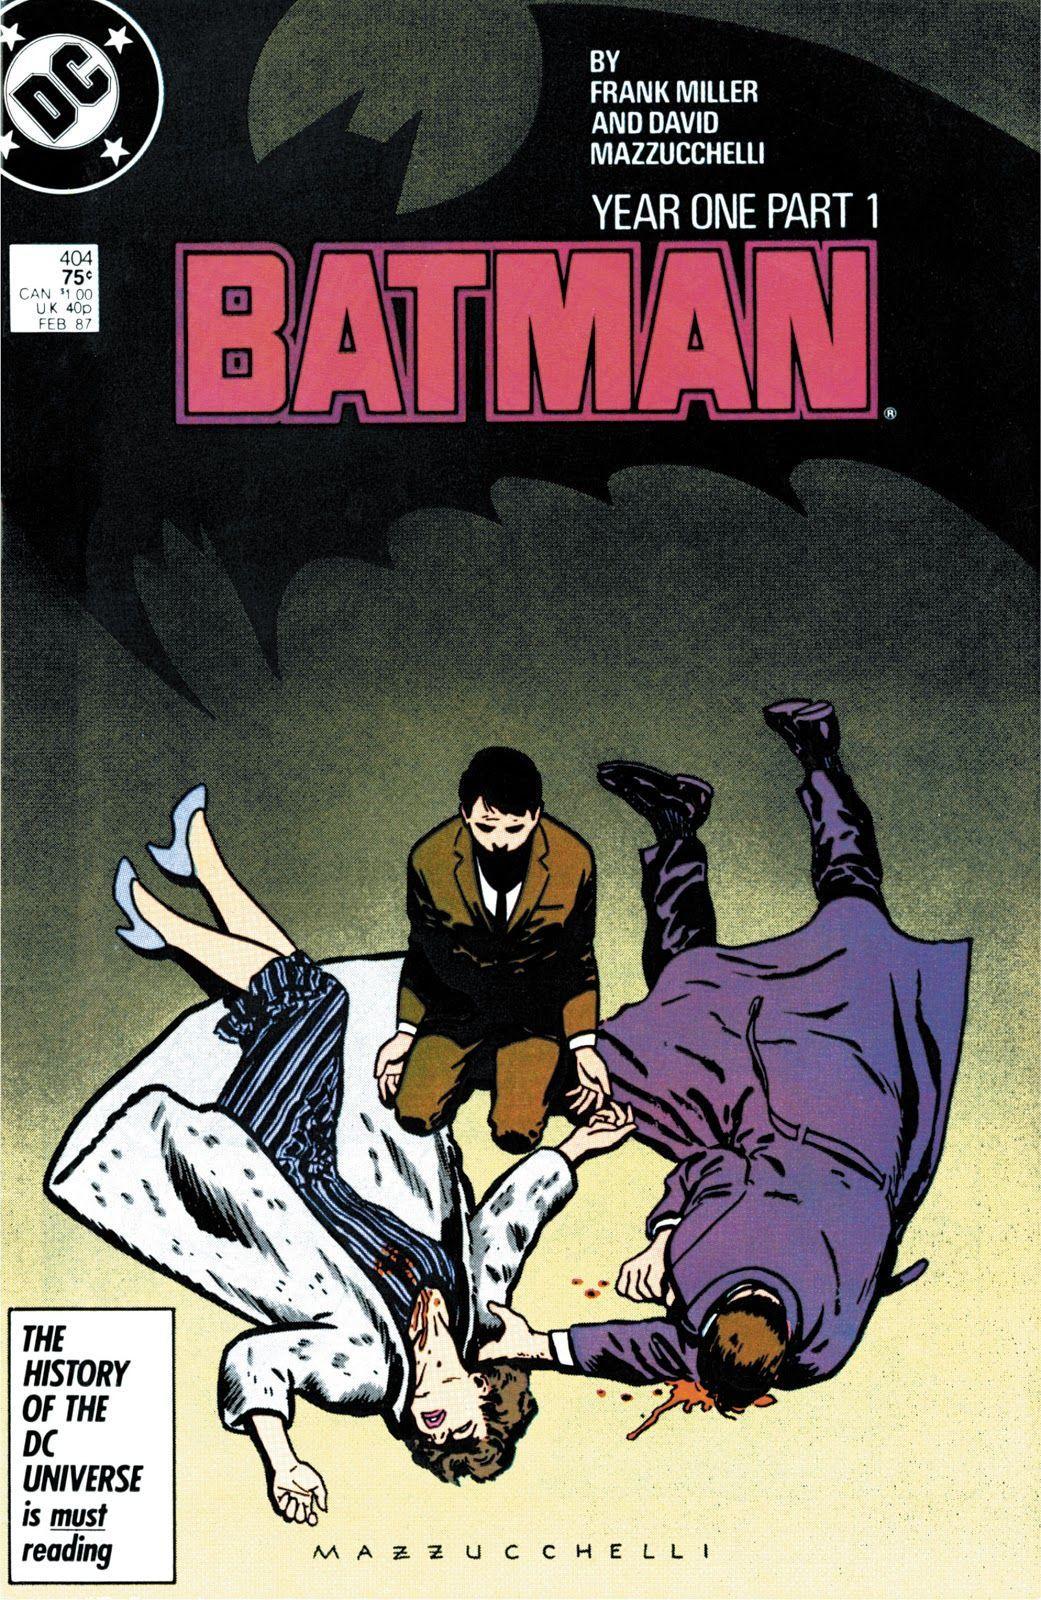 Batman #404 (Writer: Frank Miller, Artist: David Mazzucchelli)